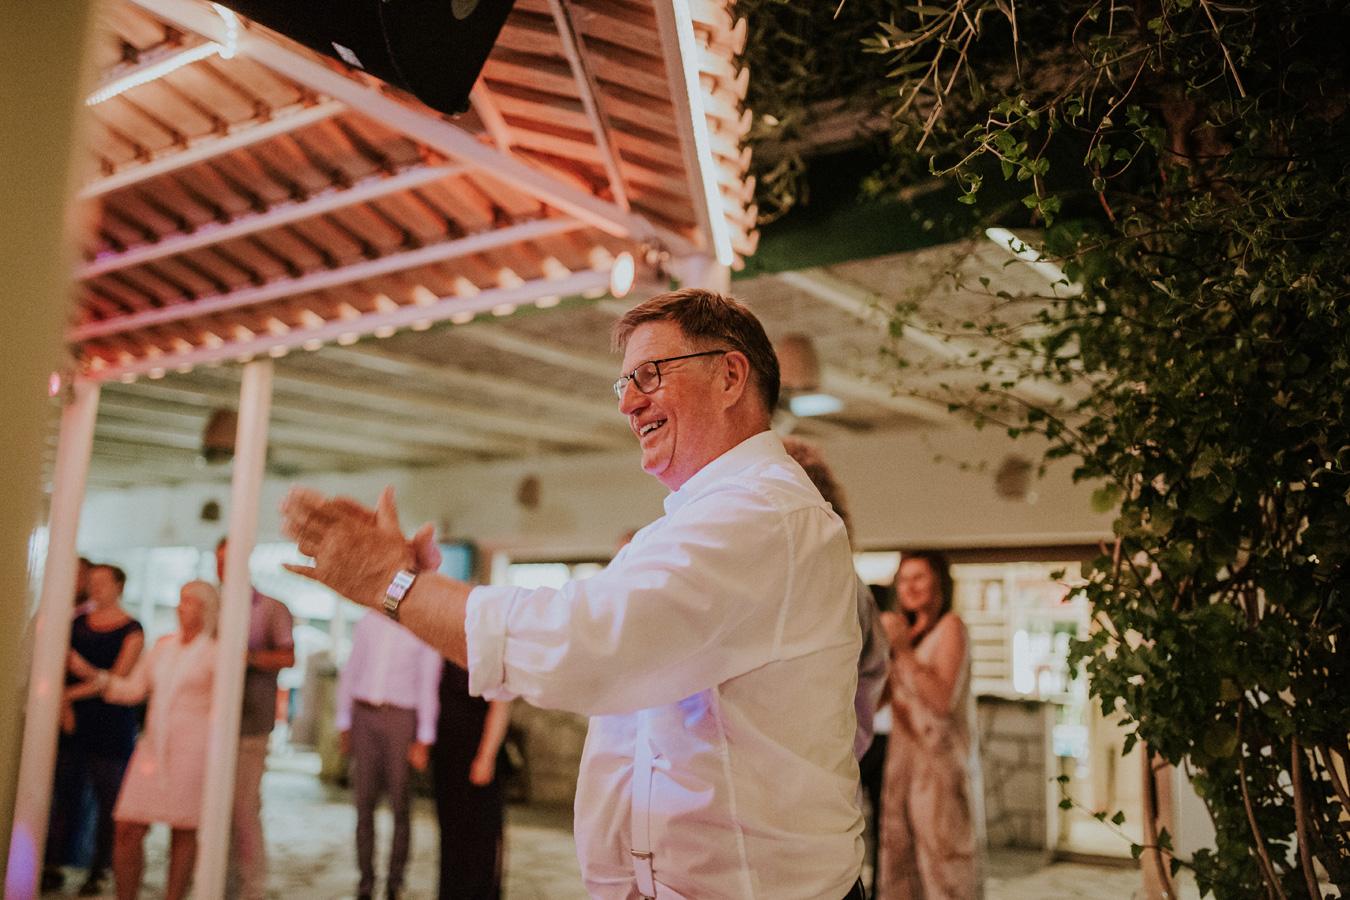 097-bryllupsfotograf-oslo-destinasjonsbryllup-fotograf-tone-tvedt.jpg